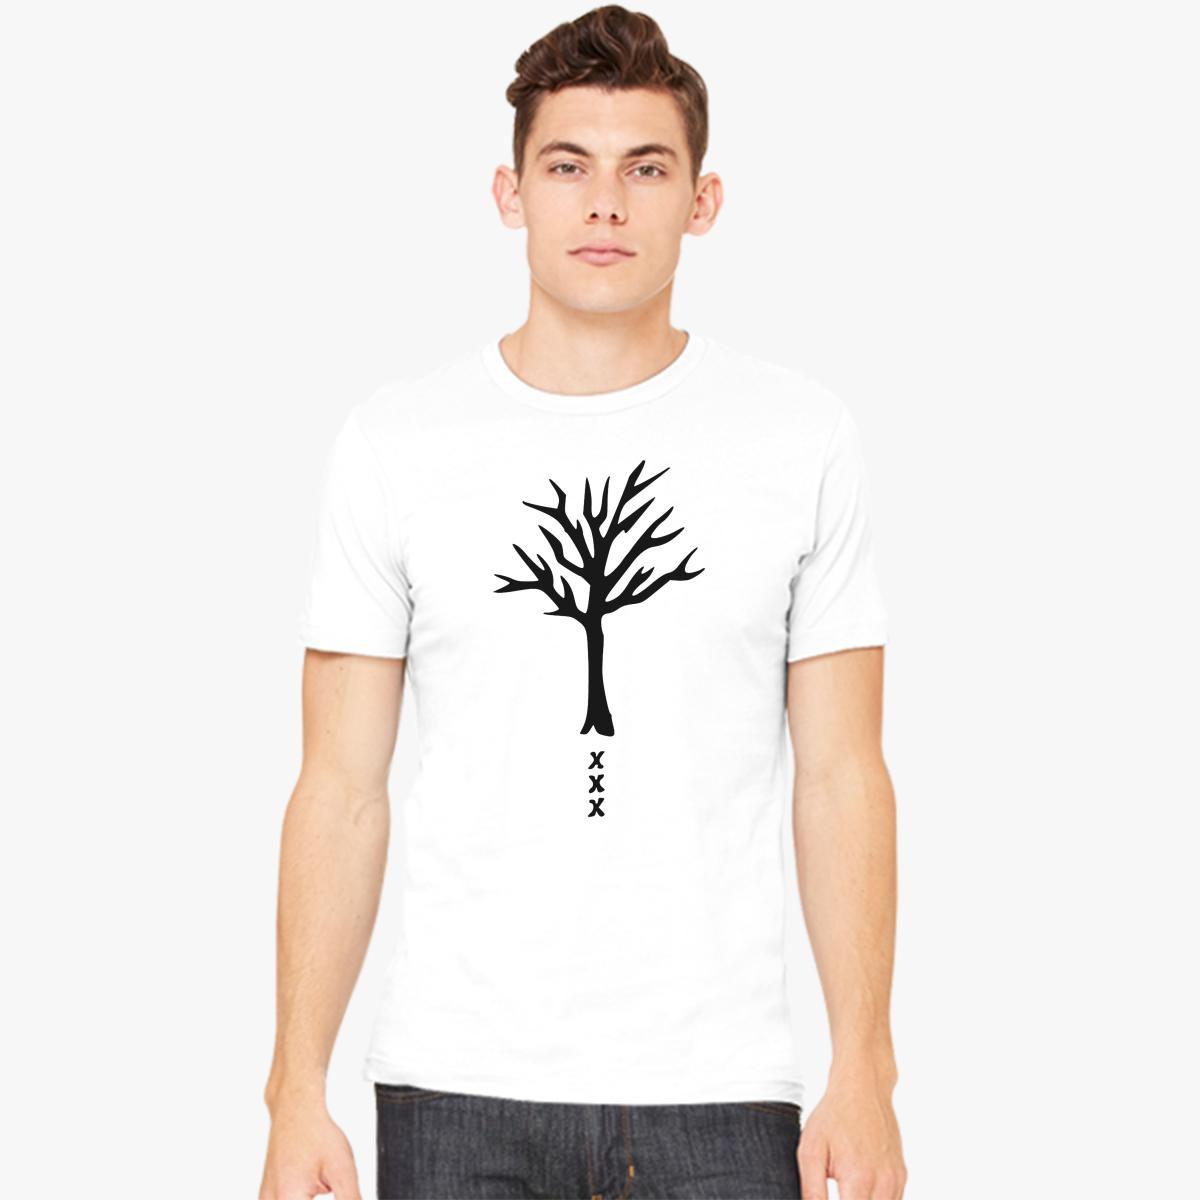 ec6defdd XXXTENTACION Tribute Men's T-shirt - Customon